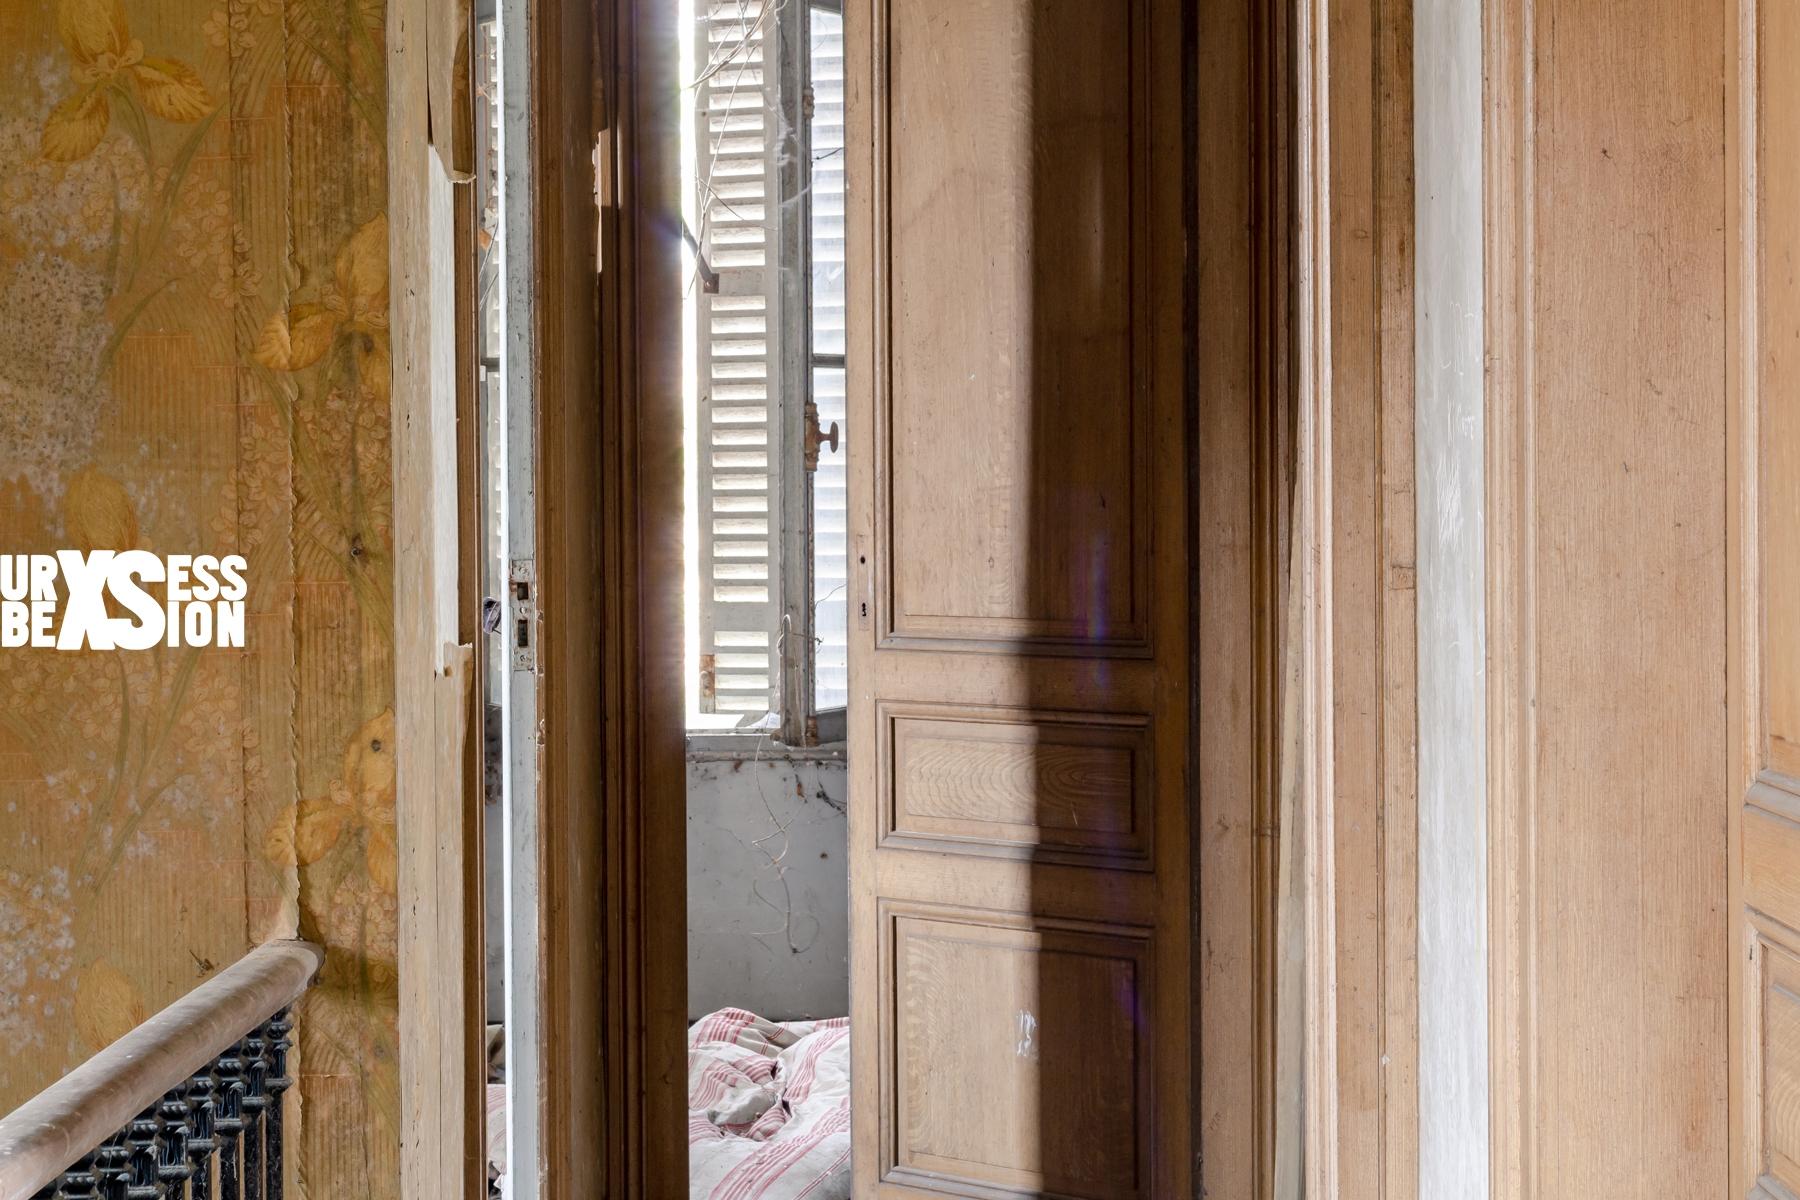 Château abandonné en Aquitaine | urbexsession.com/chateau-francisca-ballesteros | Urbex France